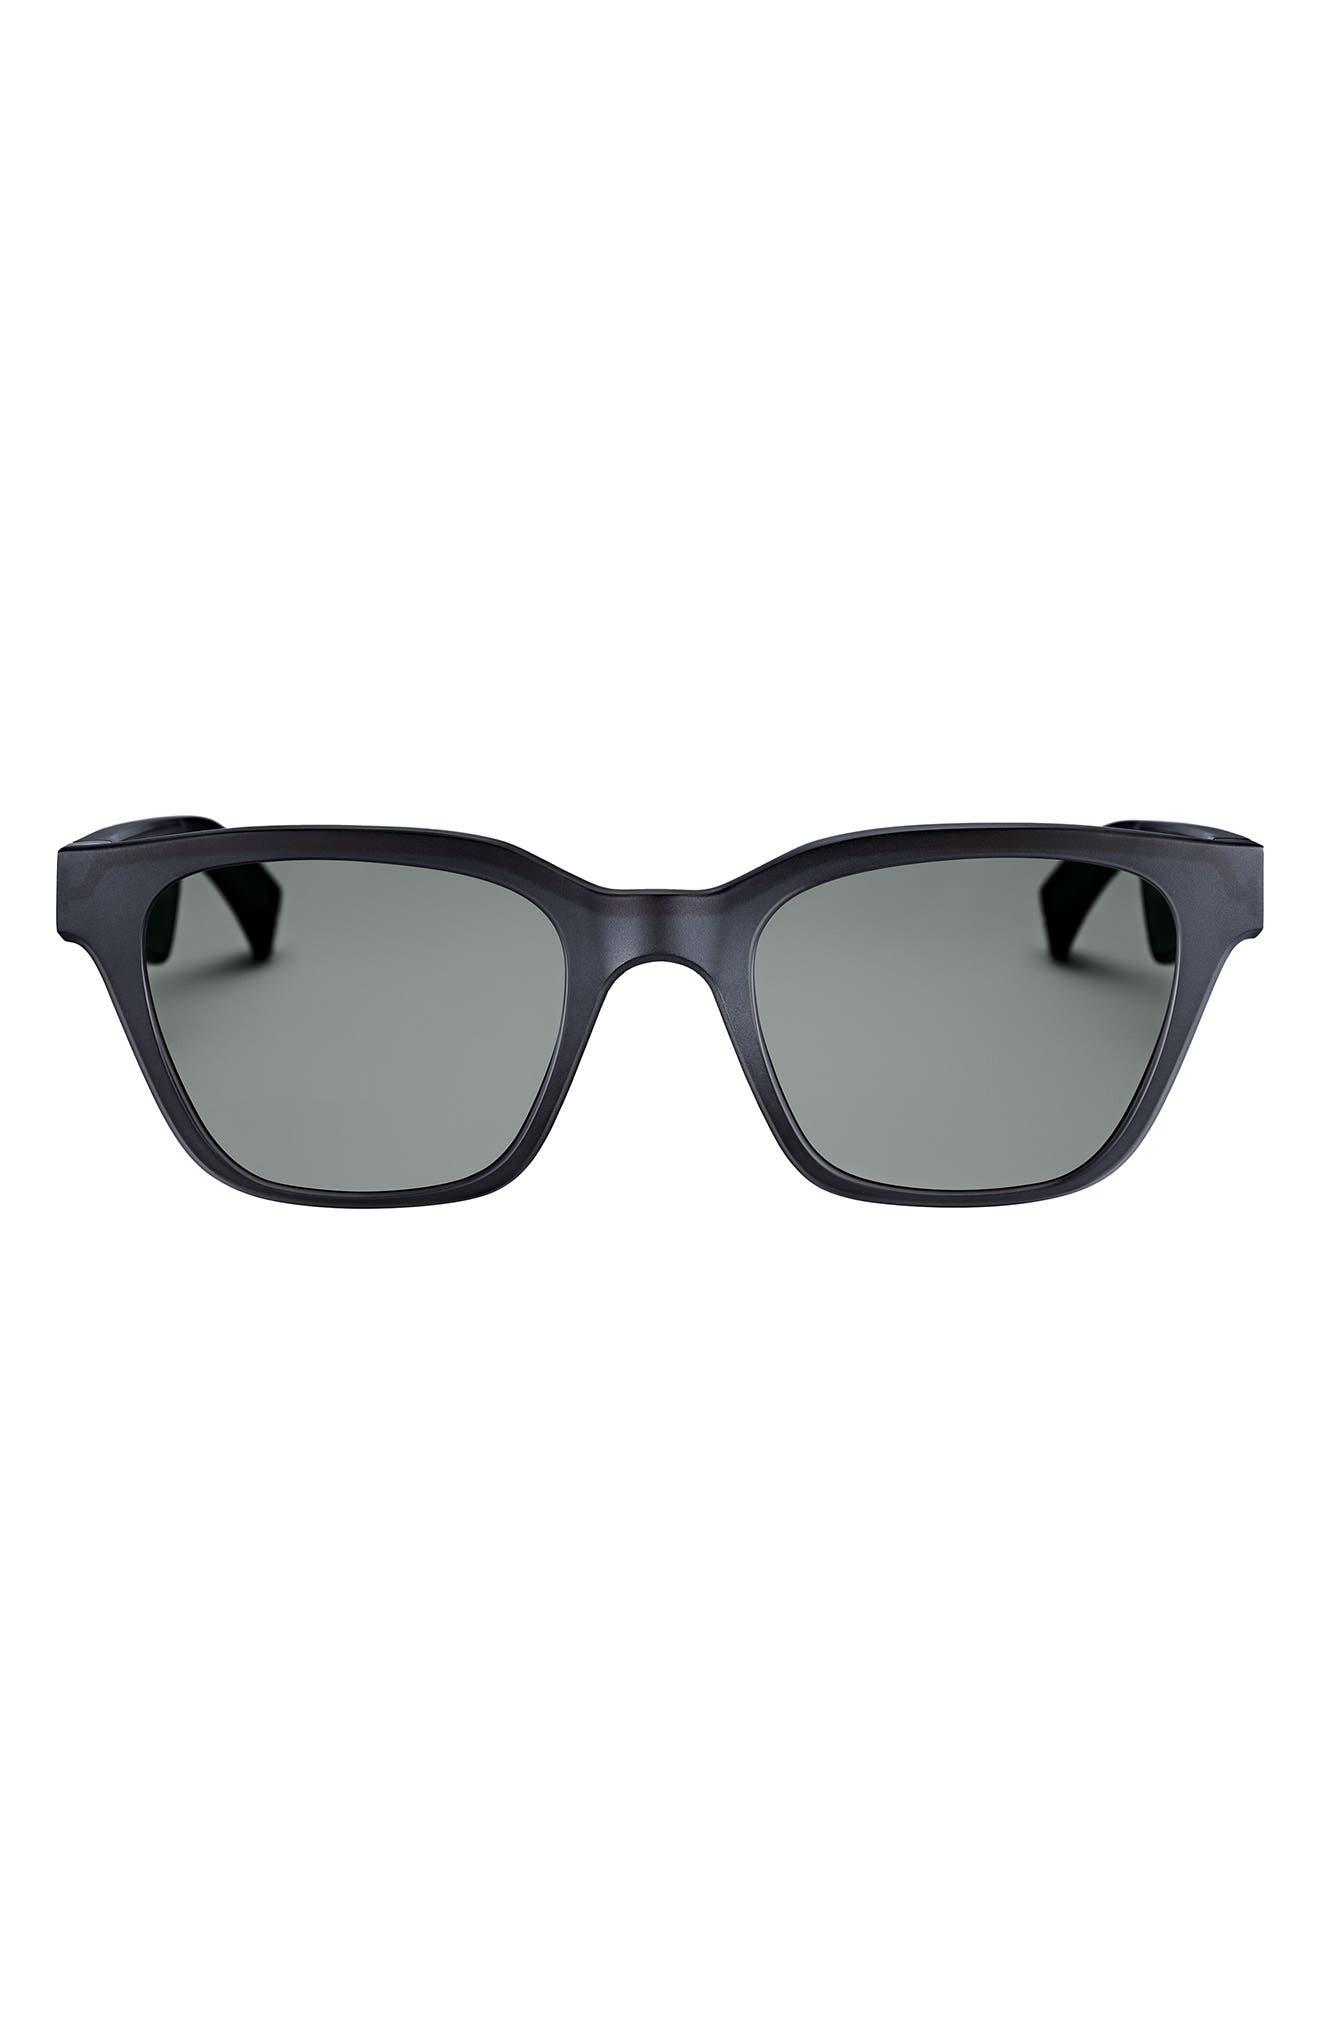 Bose Frames Alto Small/medium 51mm Audio Sunglasses